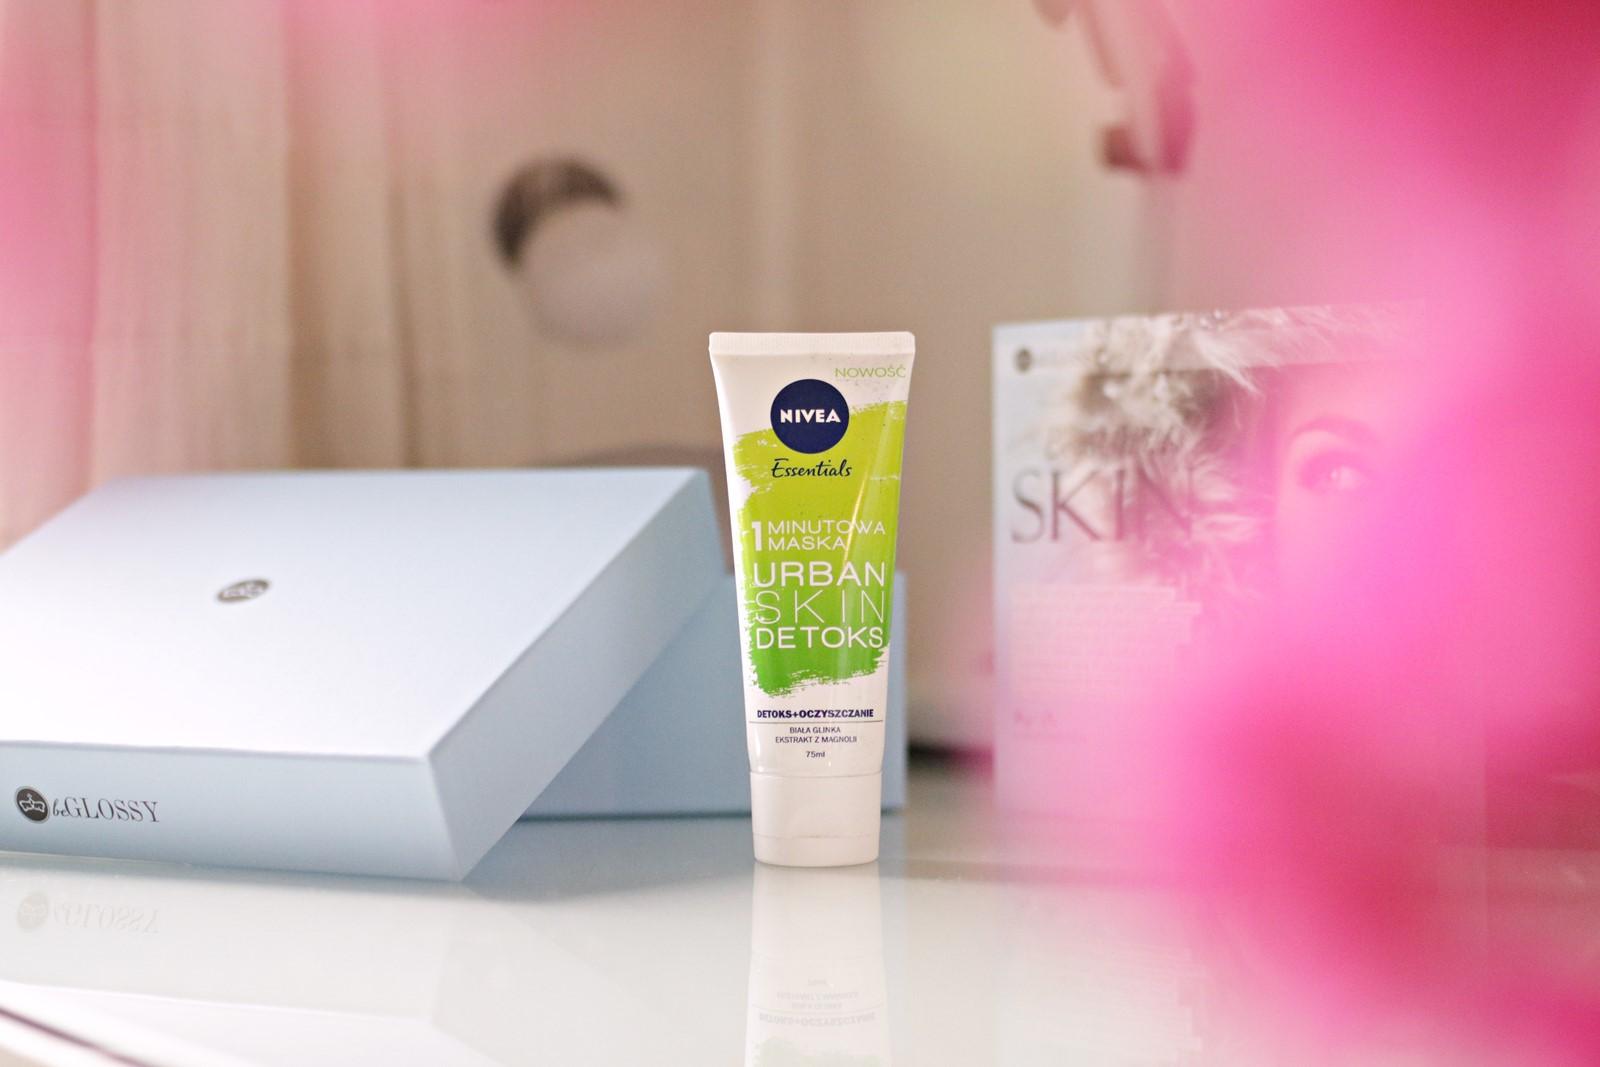 beGLOSSY Begin With Skin- Nivea 1-minutowa maska